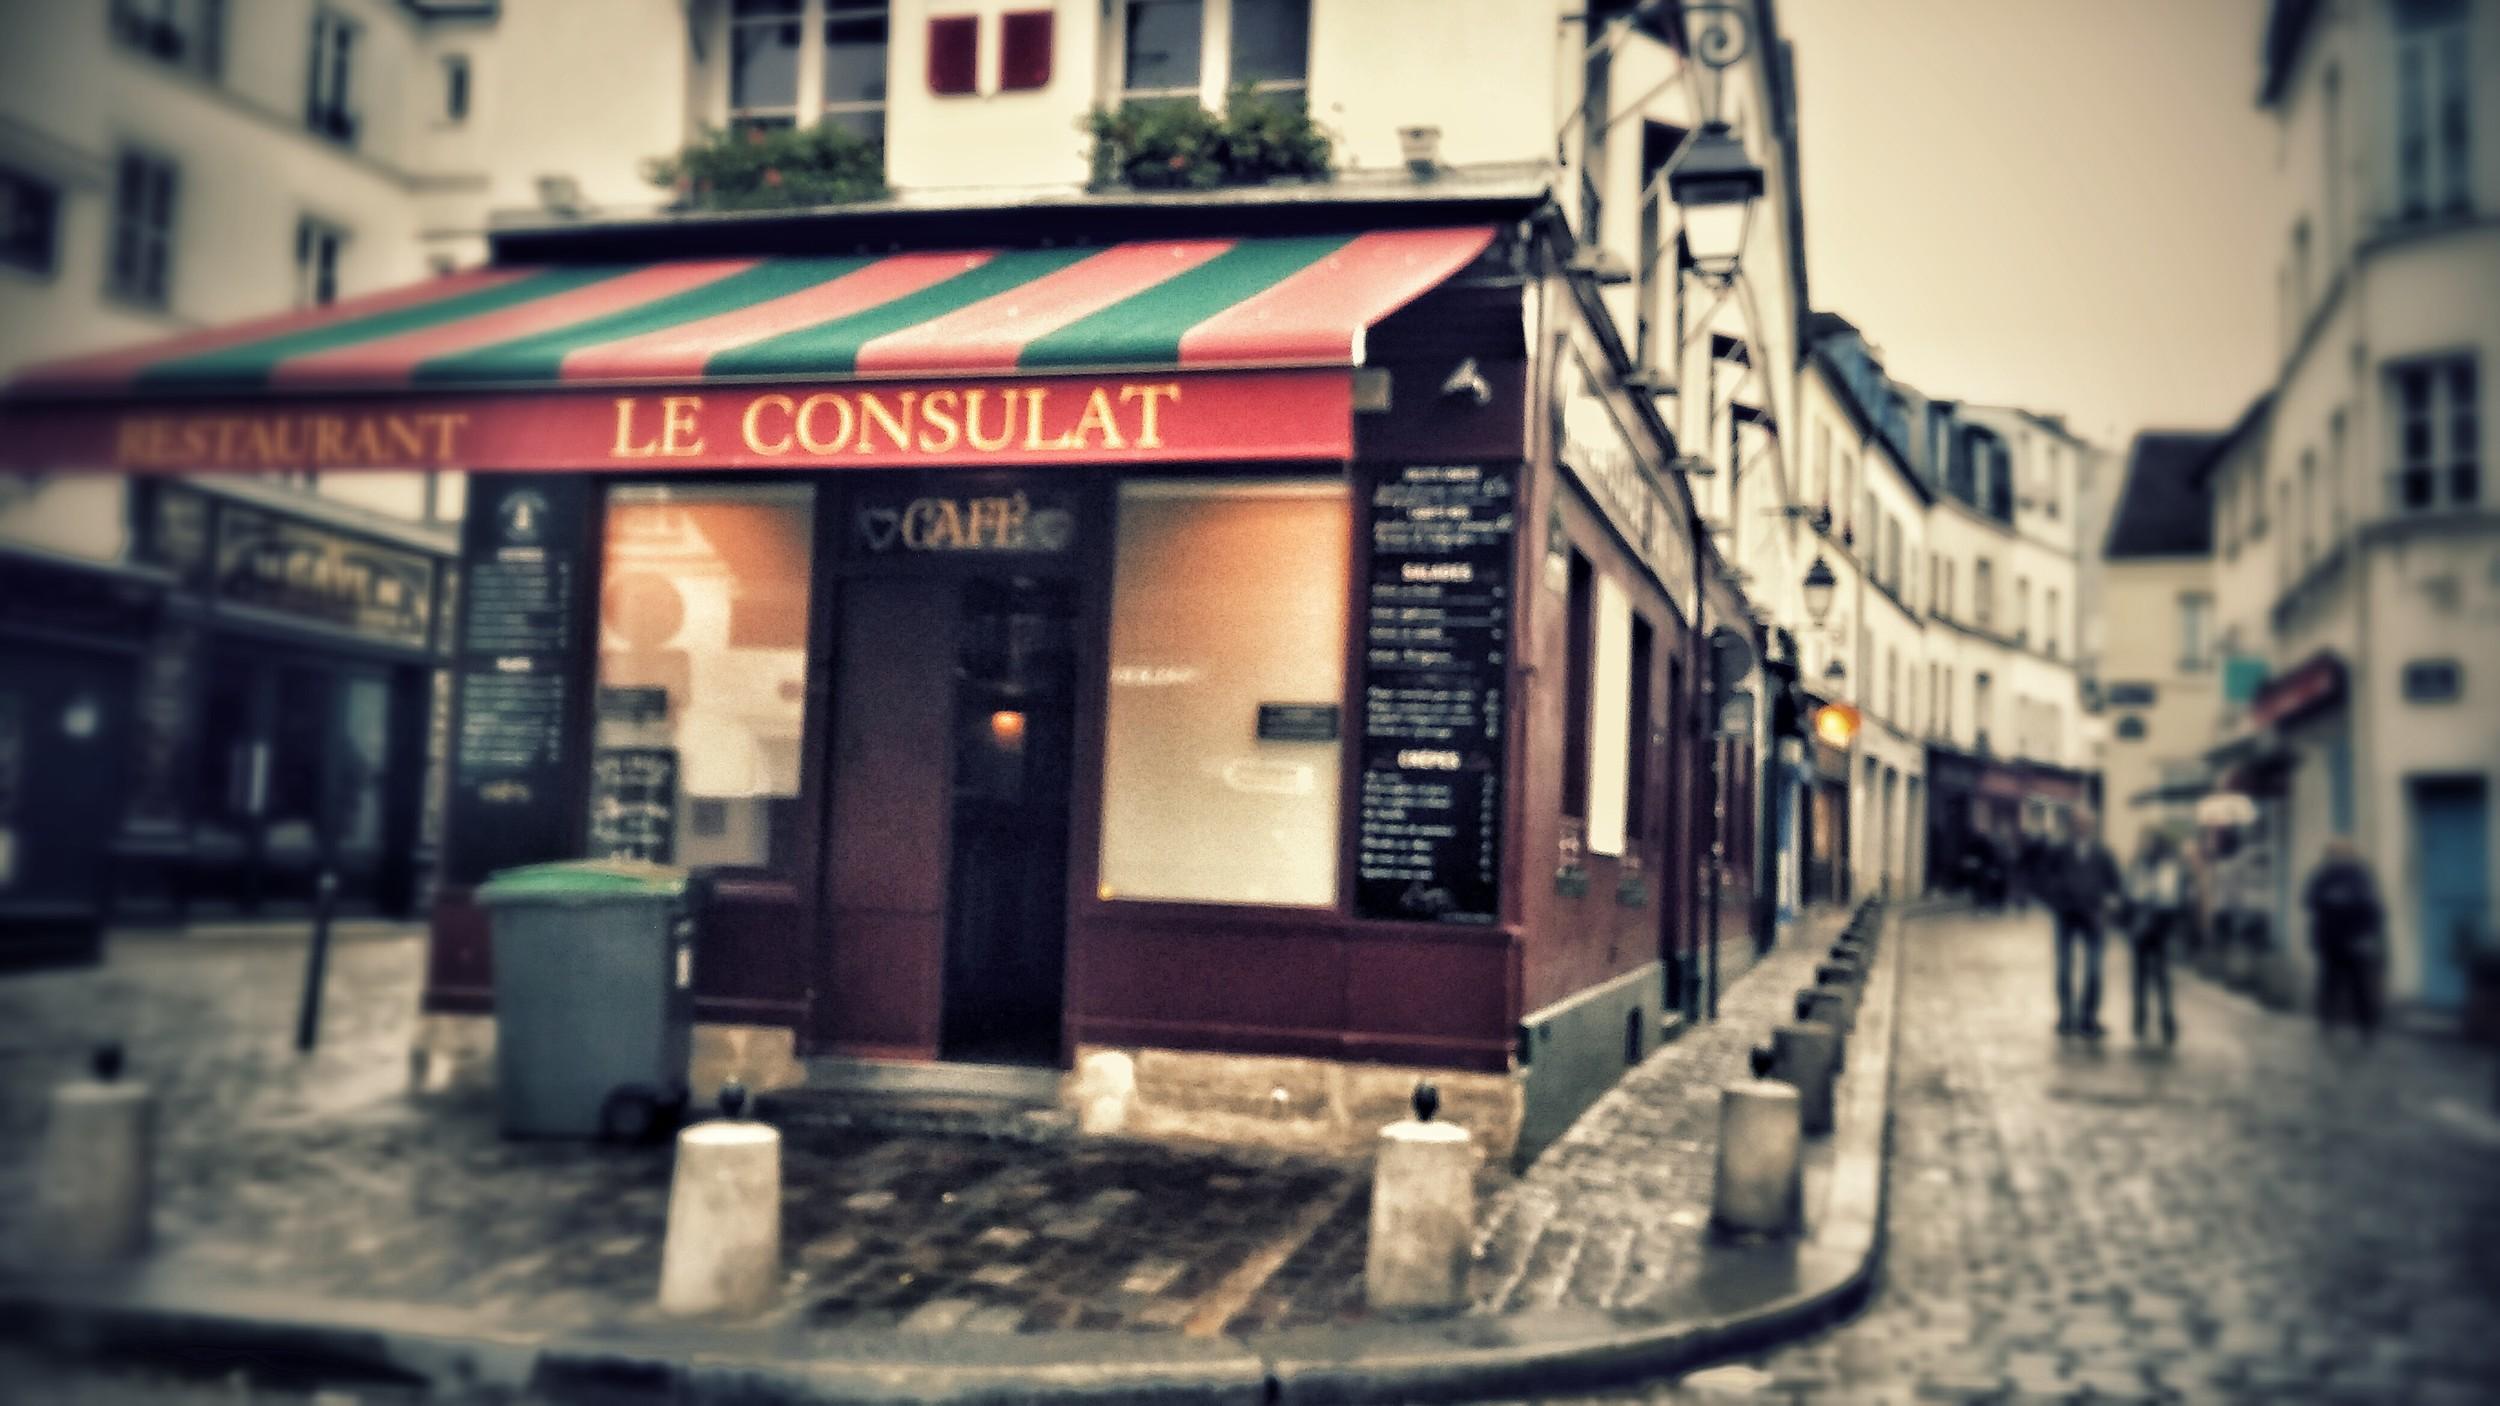 Le Consulat  in Montmartre